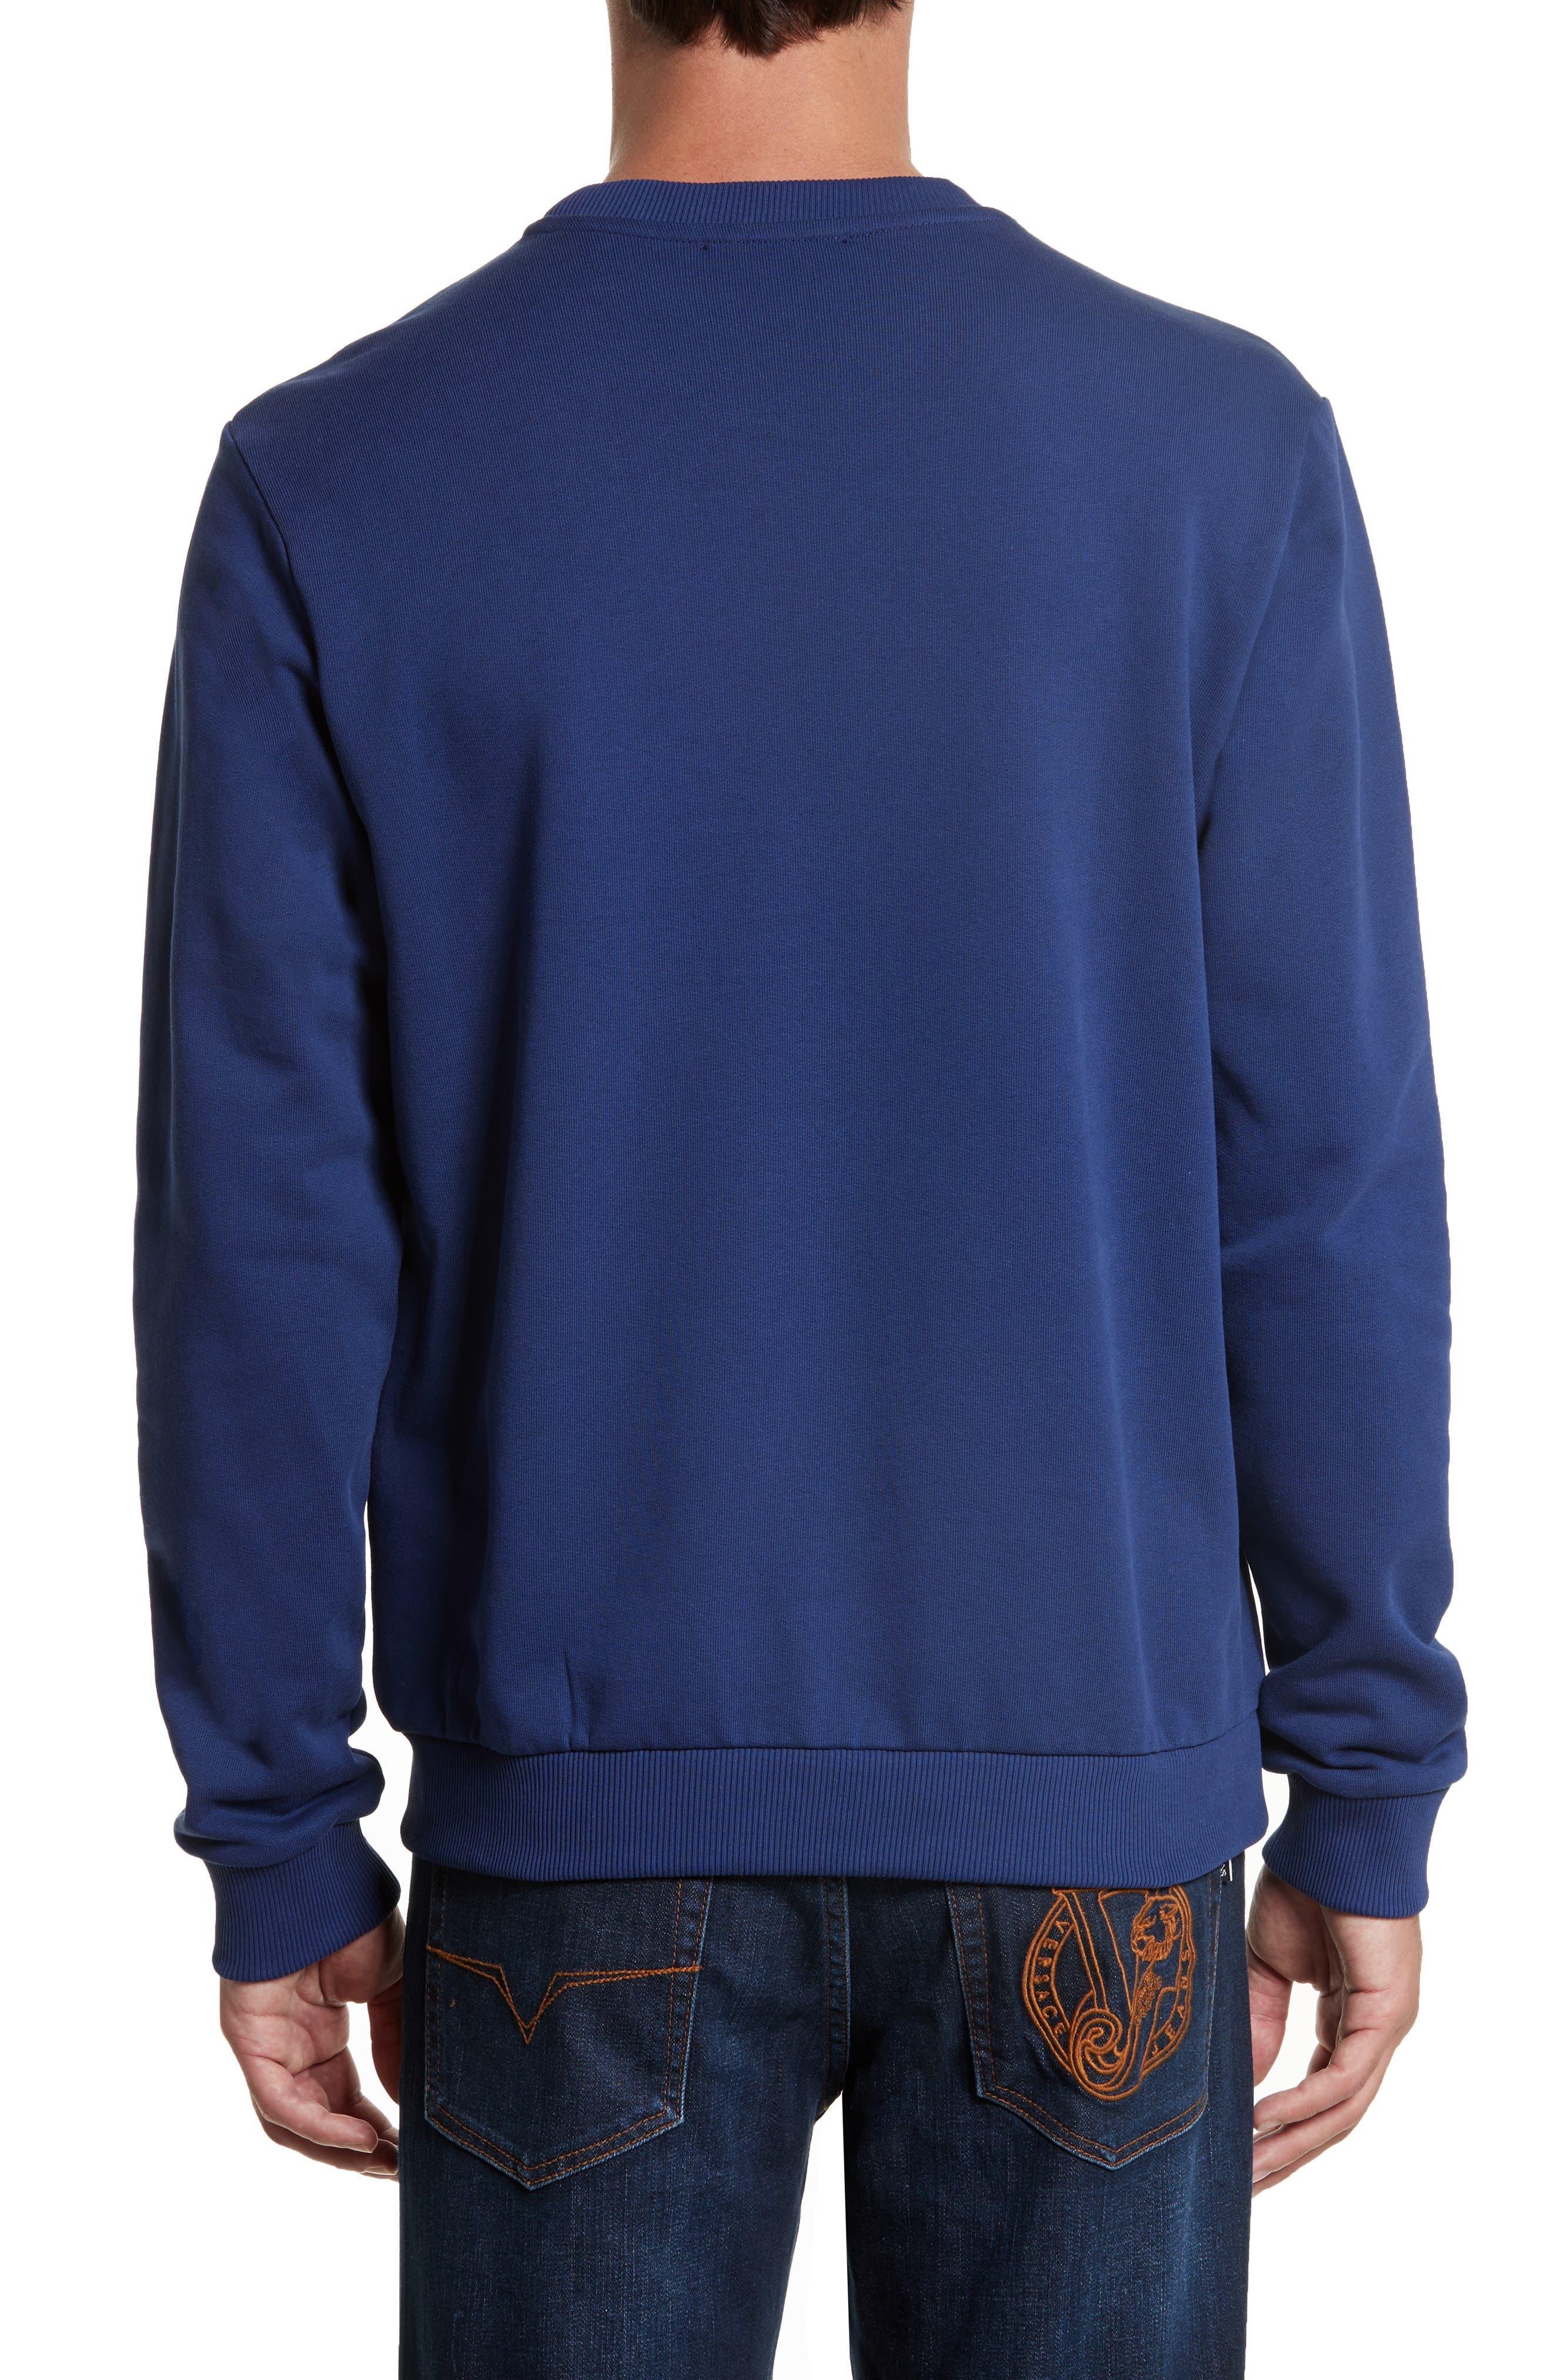 Embroidered Crewneck Sweatshirt,                             Alternate thumbnail 2, color,                             Blue